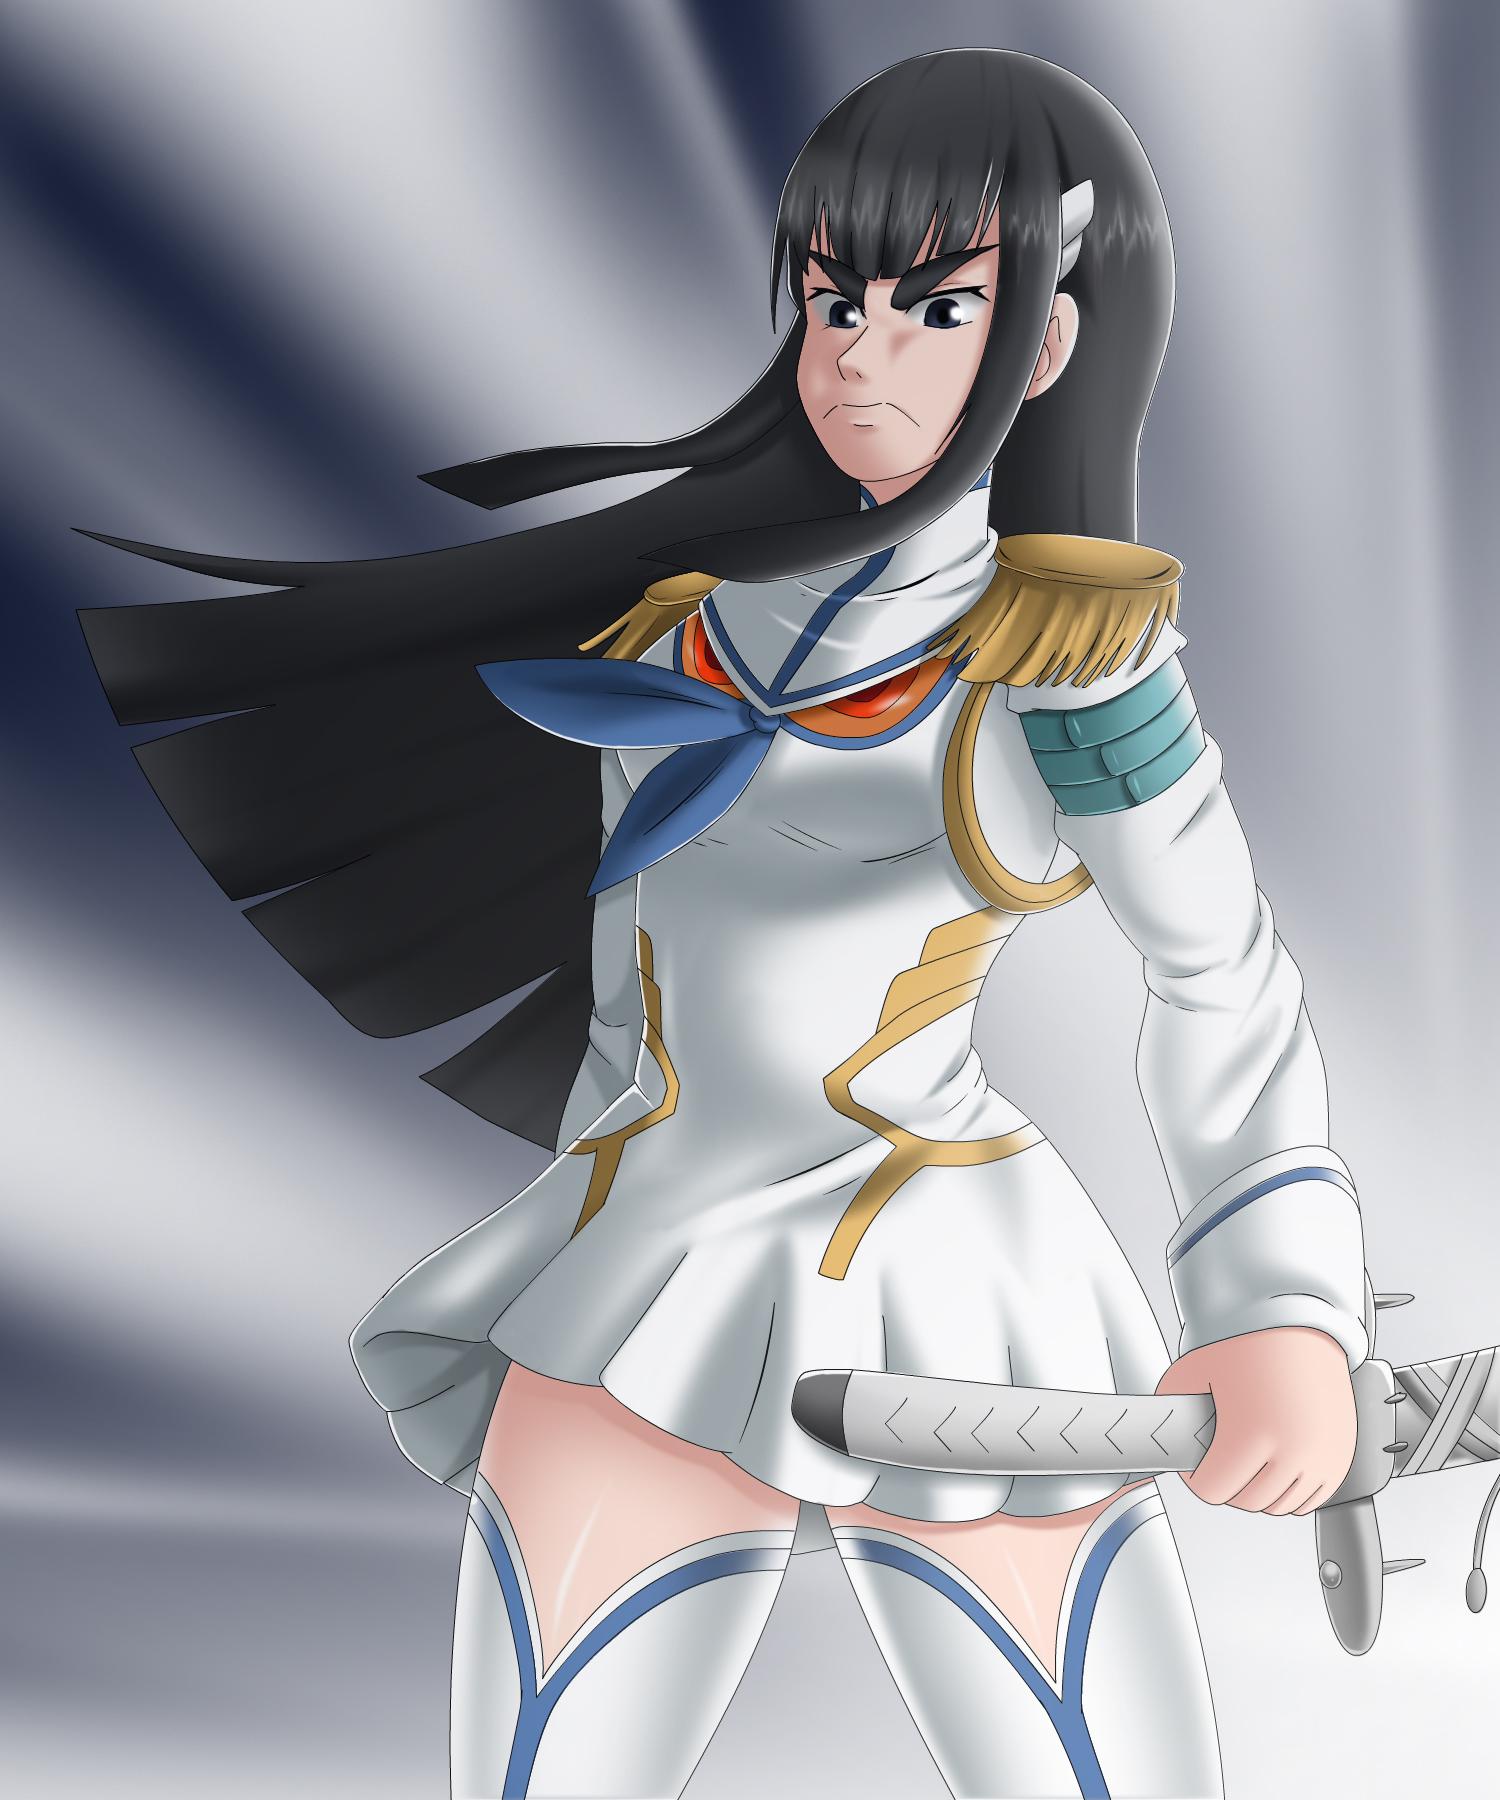 Kiryuuin Satsuki